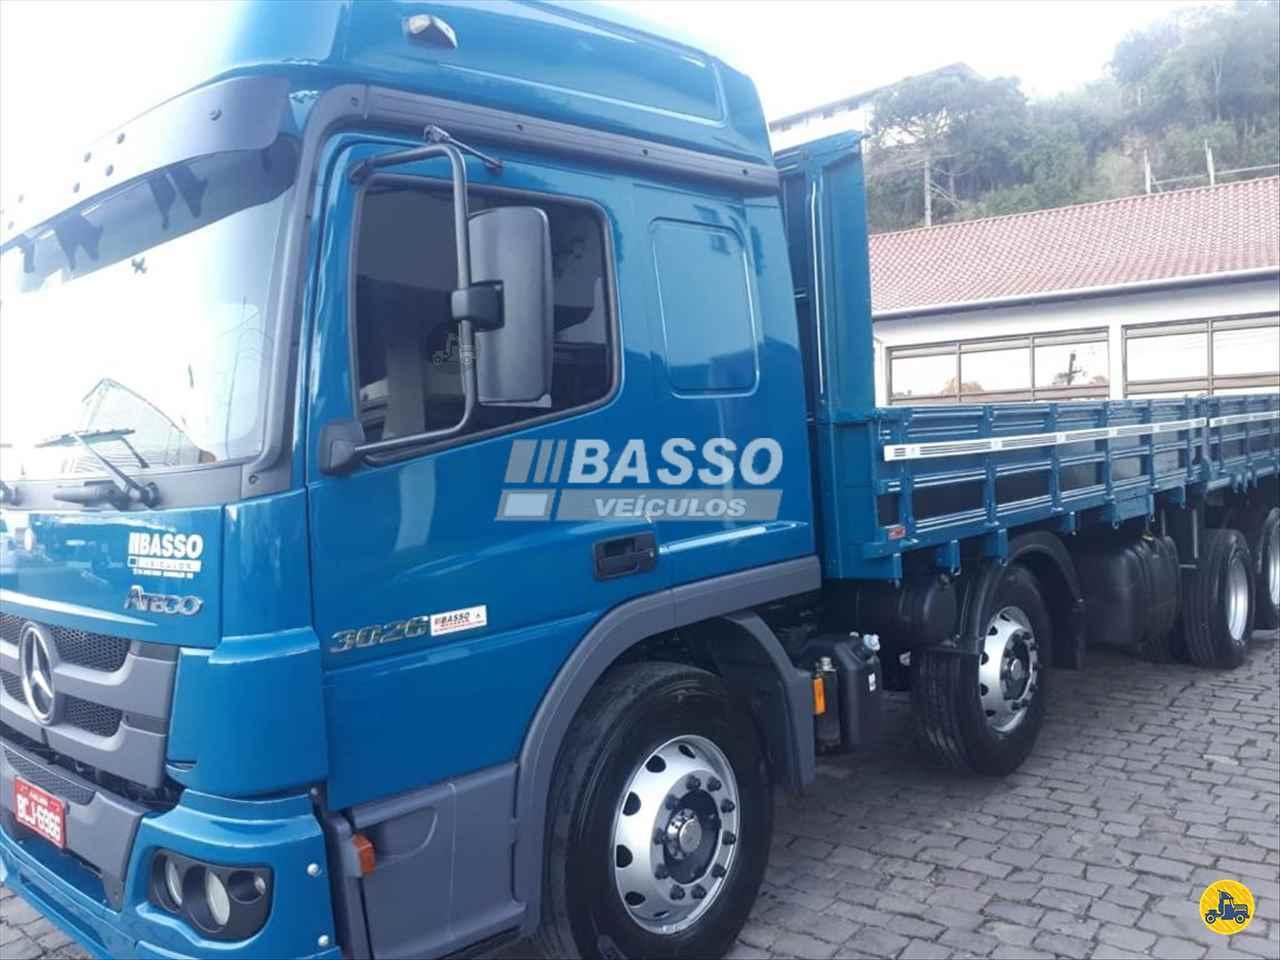 CAMINHAO MERCEDES-BENZ MB 3026 Carga Seca BiTruck 8x2 Basso Veículos GARIBALDI RIO GRANDE DO SUL RS